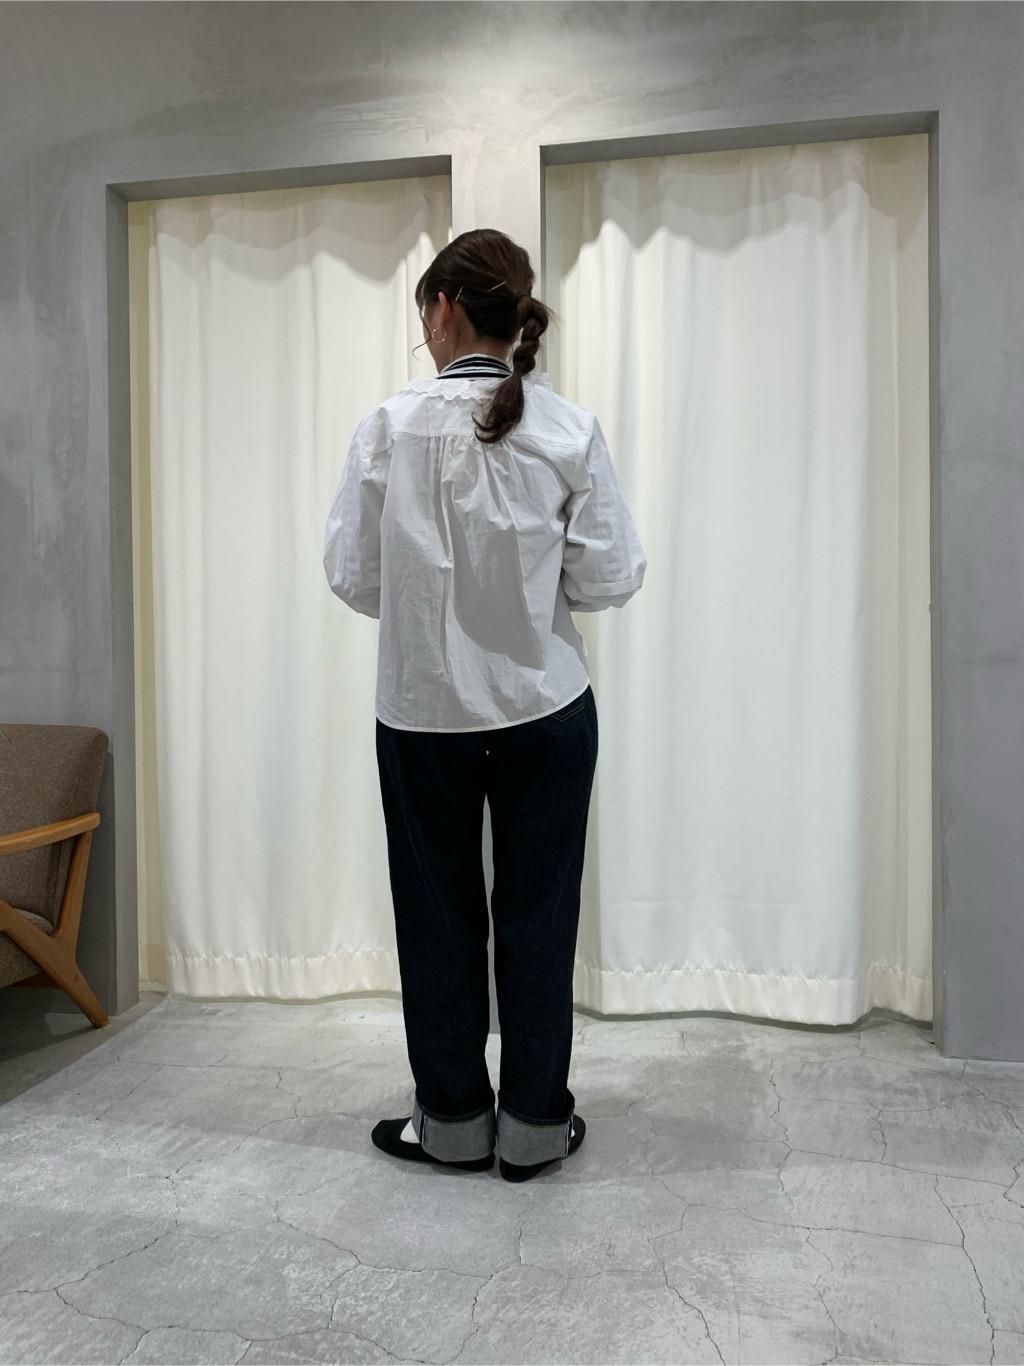 - CHILD WOMAN CHILD WOMAN , PAR ICI ルミネ池袋 身長:157cm 2021.02.05